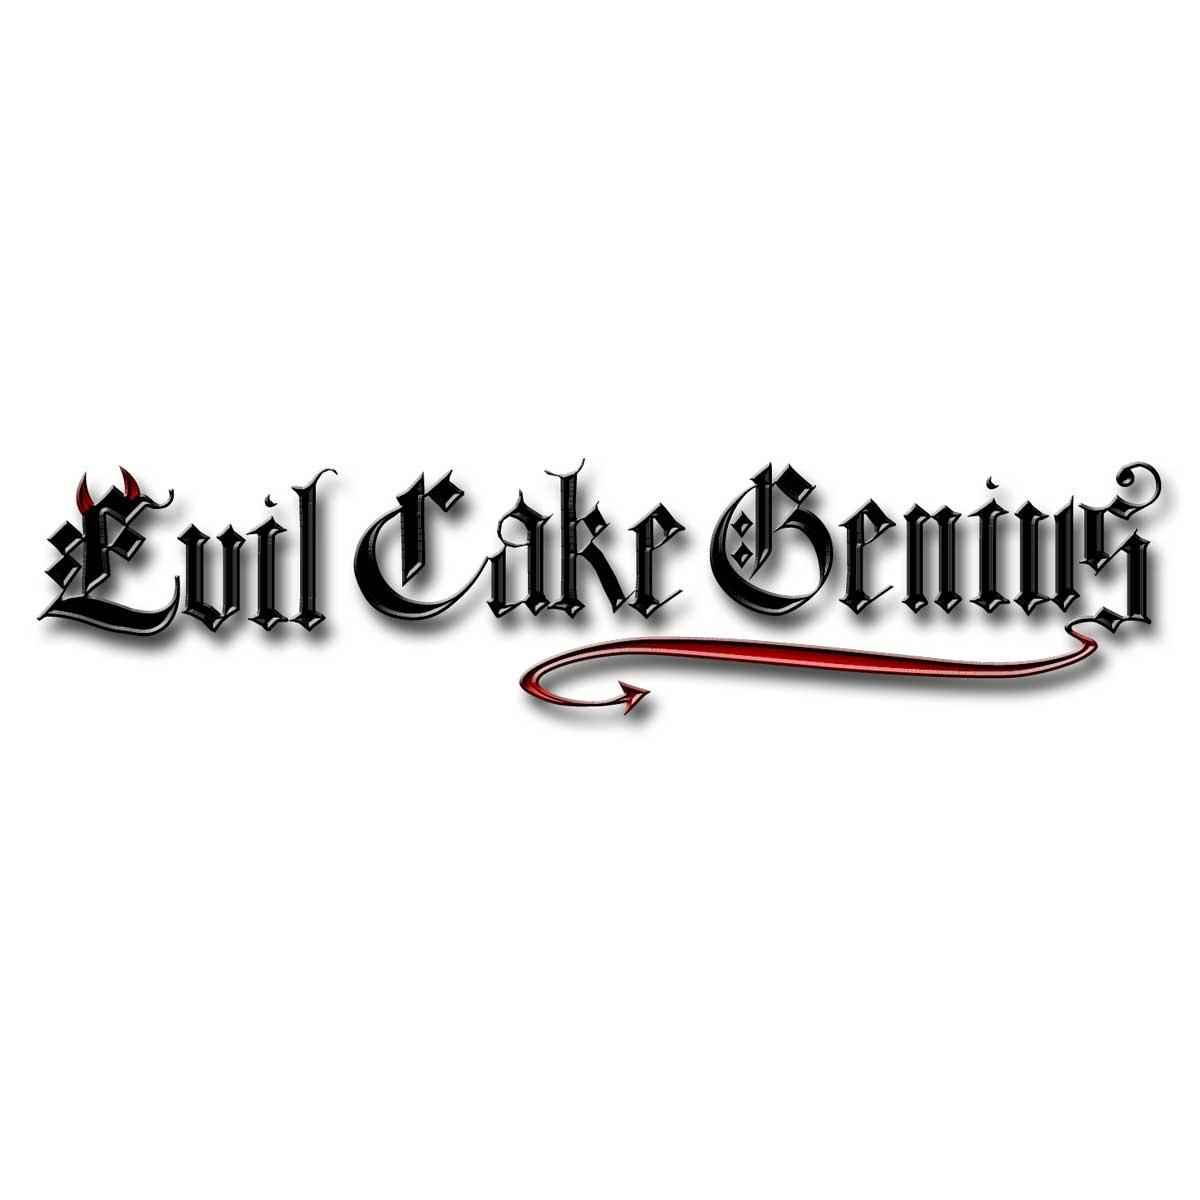 8 Inch Serrated Cake/Bread Knife